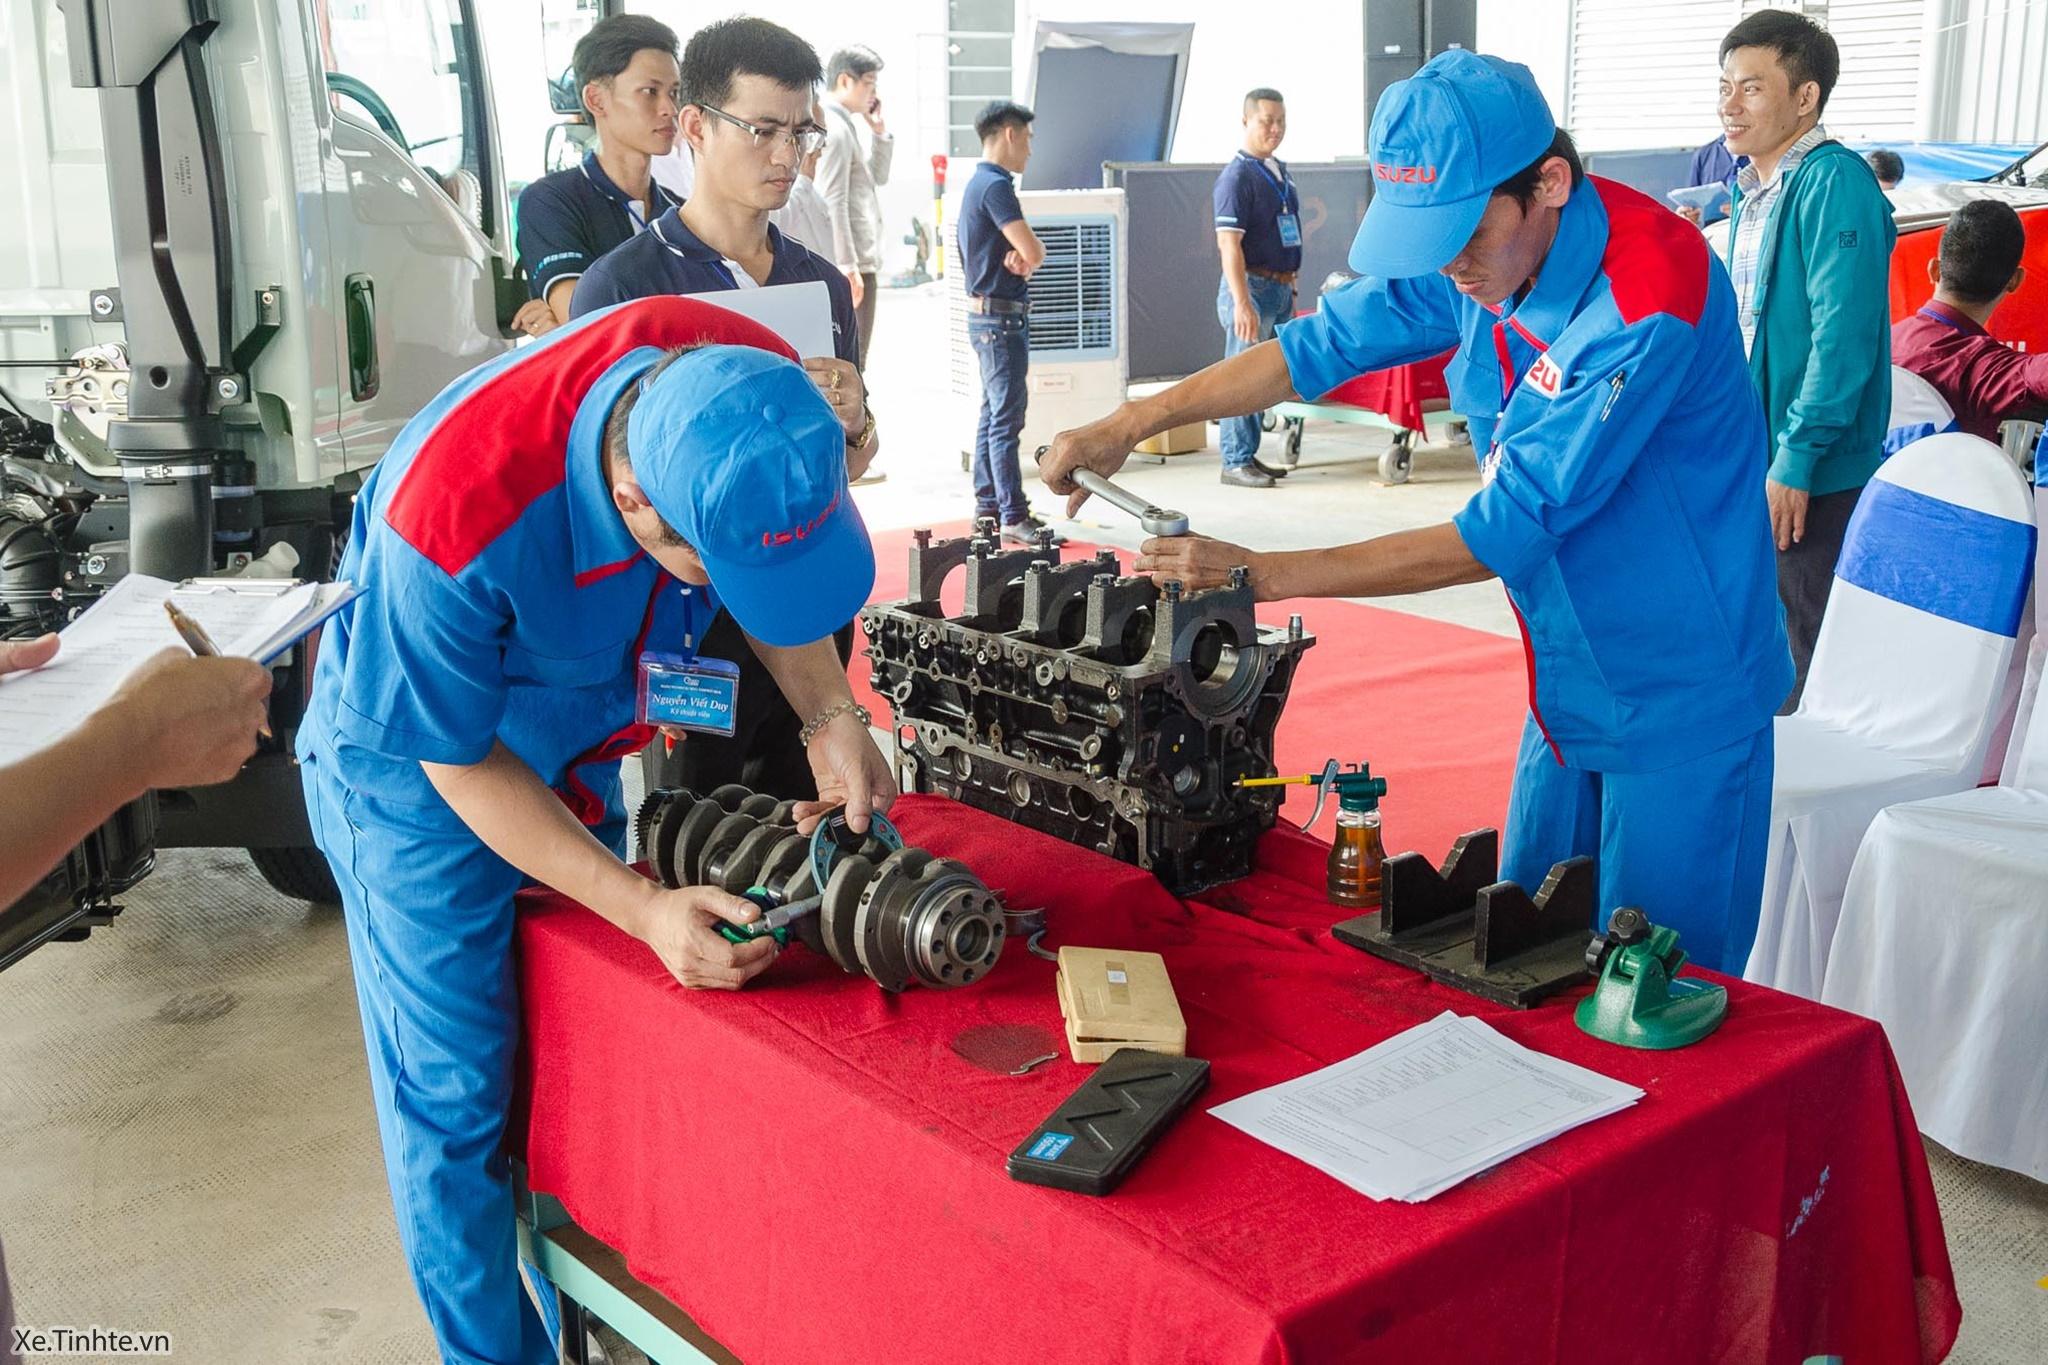 Isuzu_Technical_Skill_Contest_2018_Xe_Tinhte-017.jpg